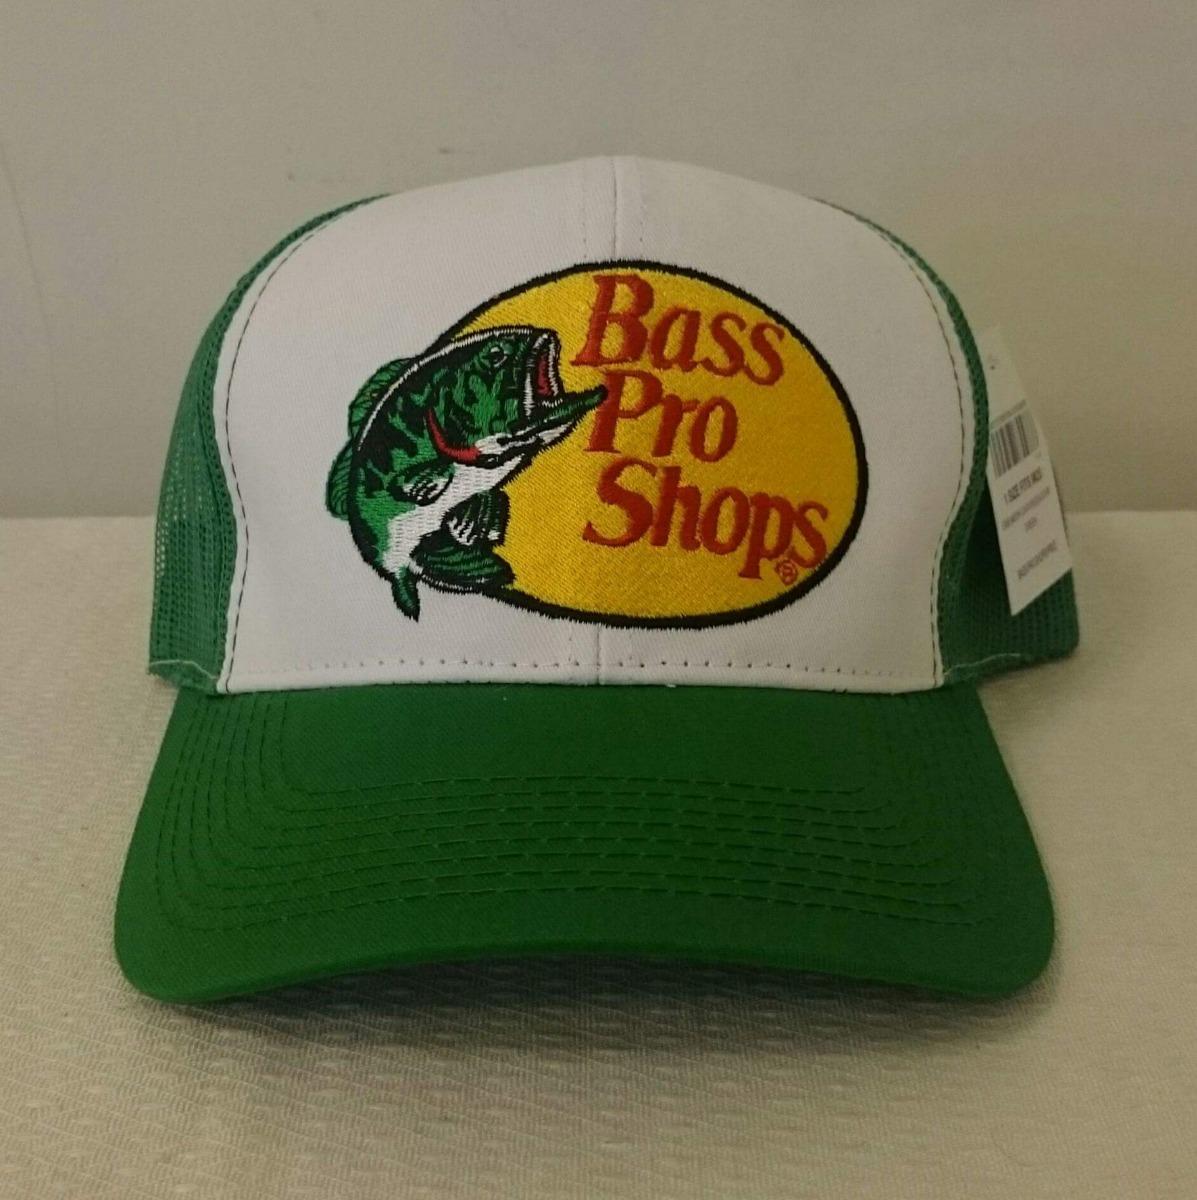 gorra bass pro shops logo bordado original disponibles!!!! Cargando zoom. 3cf121767a7